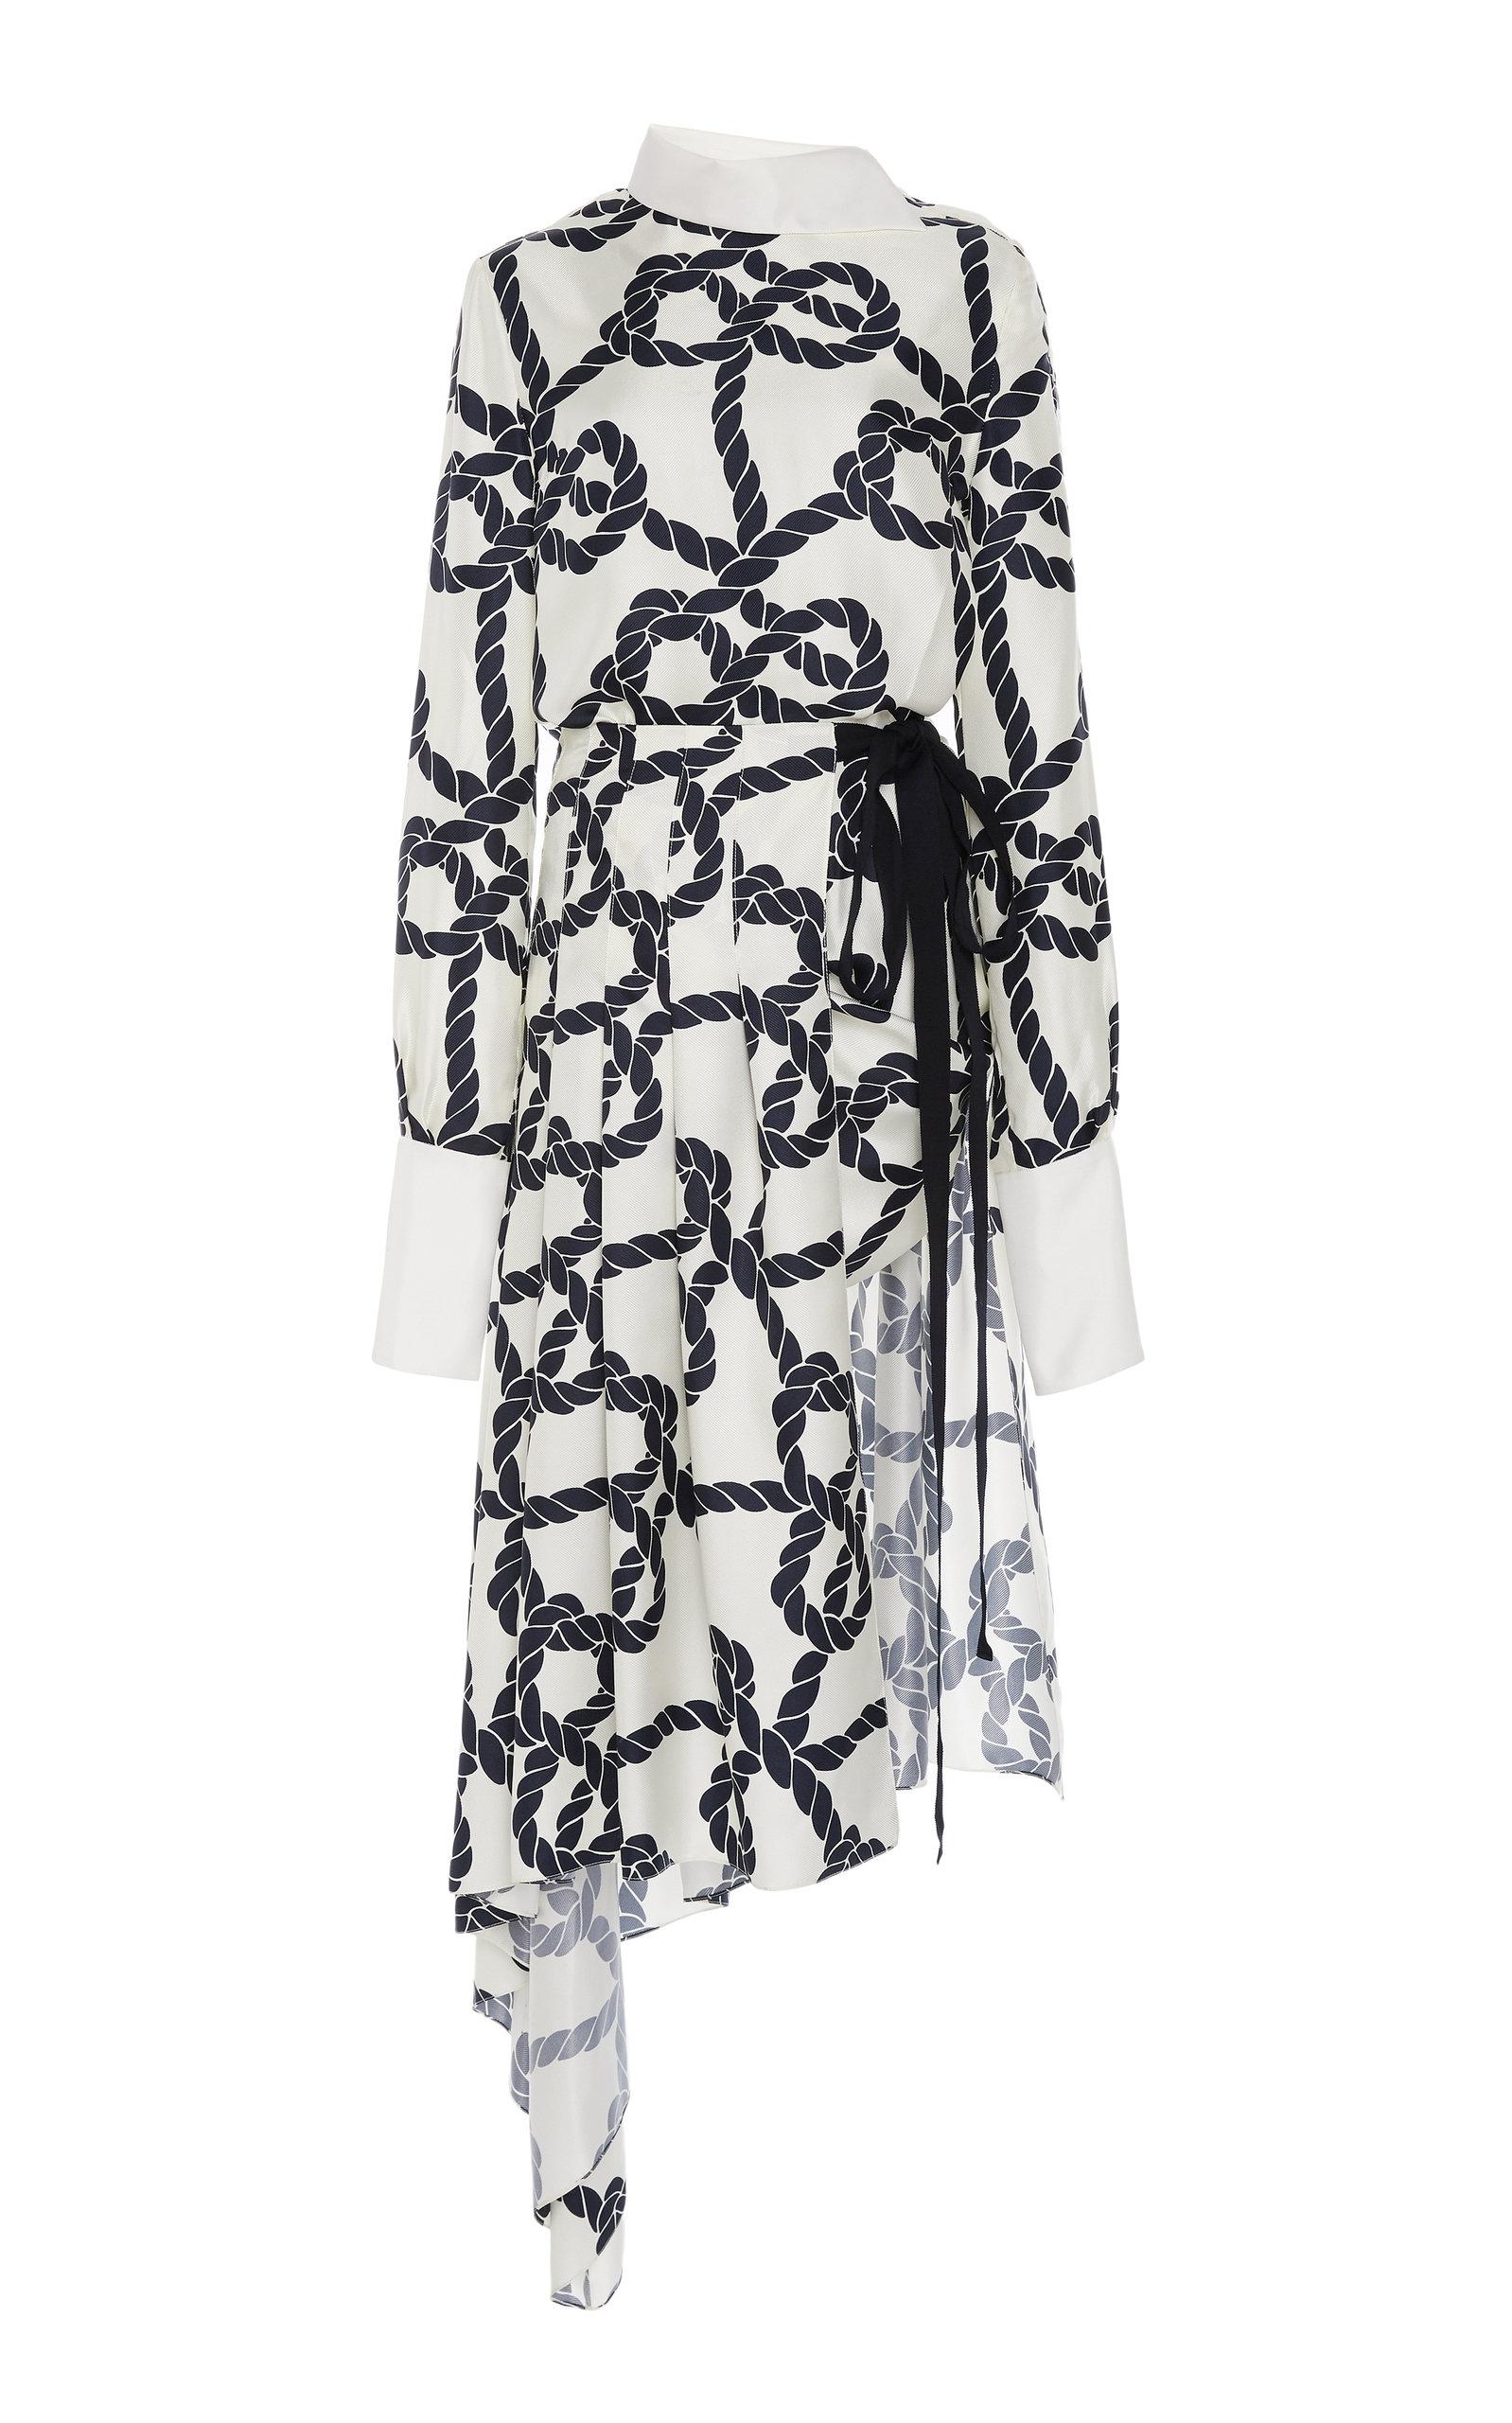 22cb62be490 MONSEAsymmetric Printed Silk-Satin Dress. CLOSE. Loading